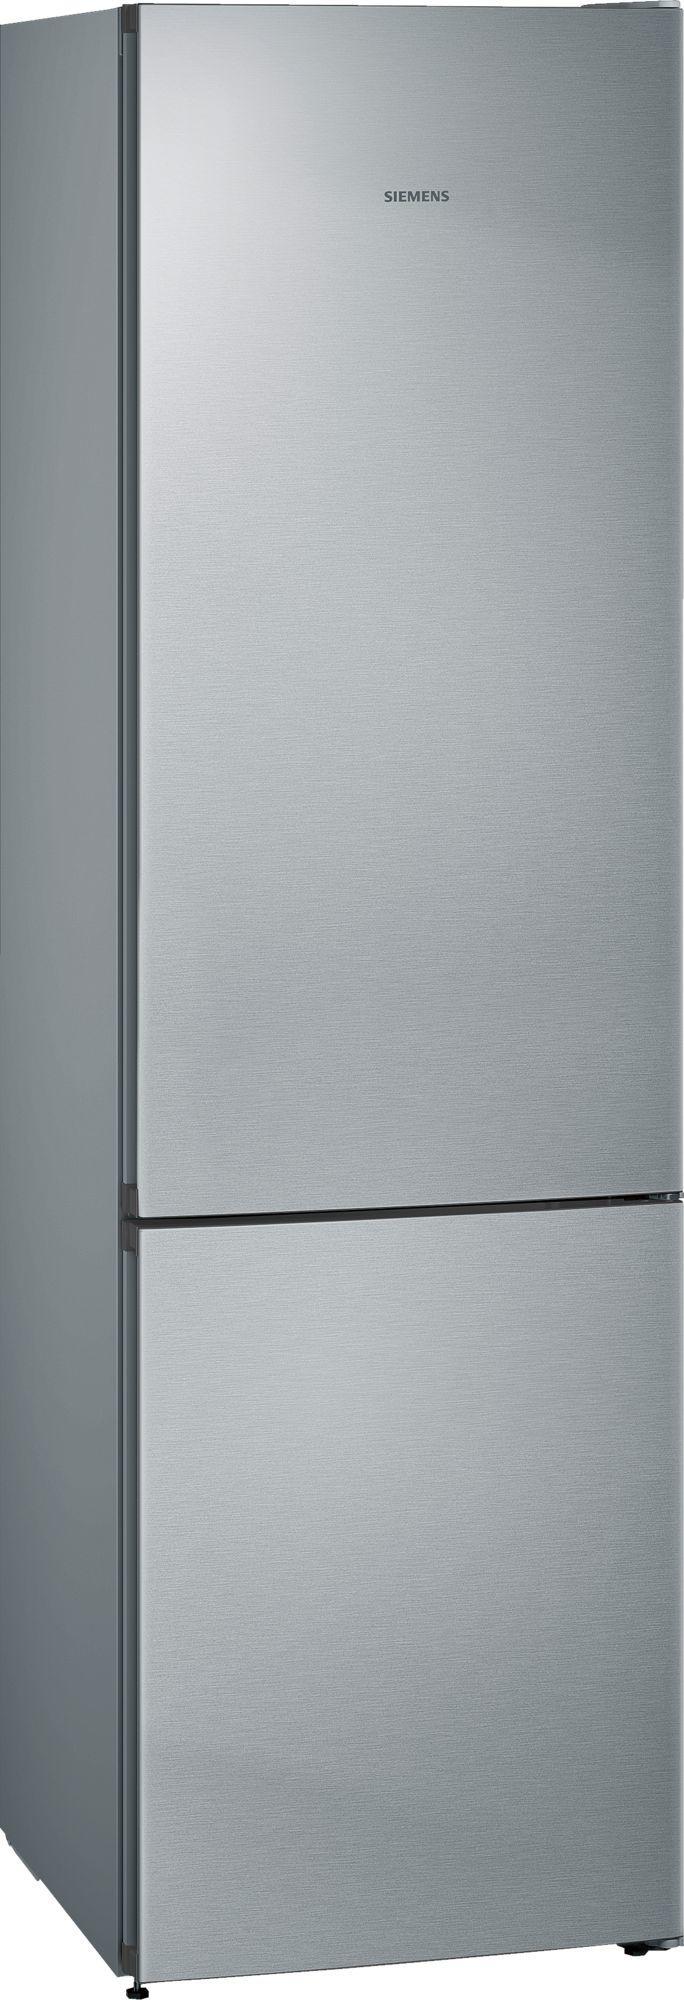 Image of iQ300 KG39NVIEC 60cm 366 Litre Frost Free Fridge Freezer | Silver Innox